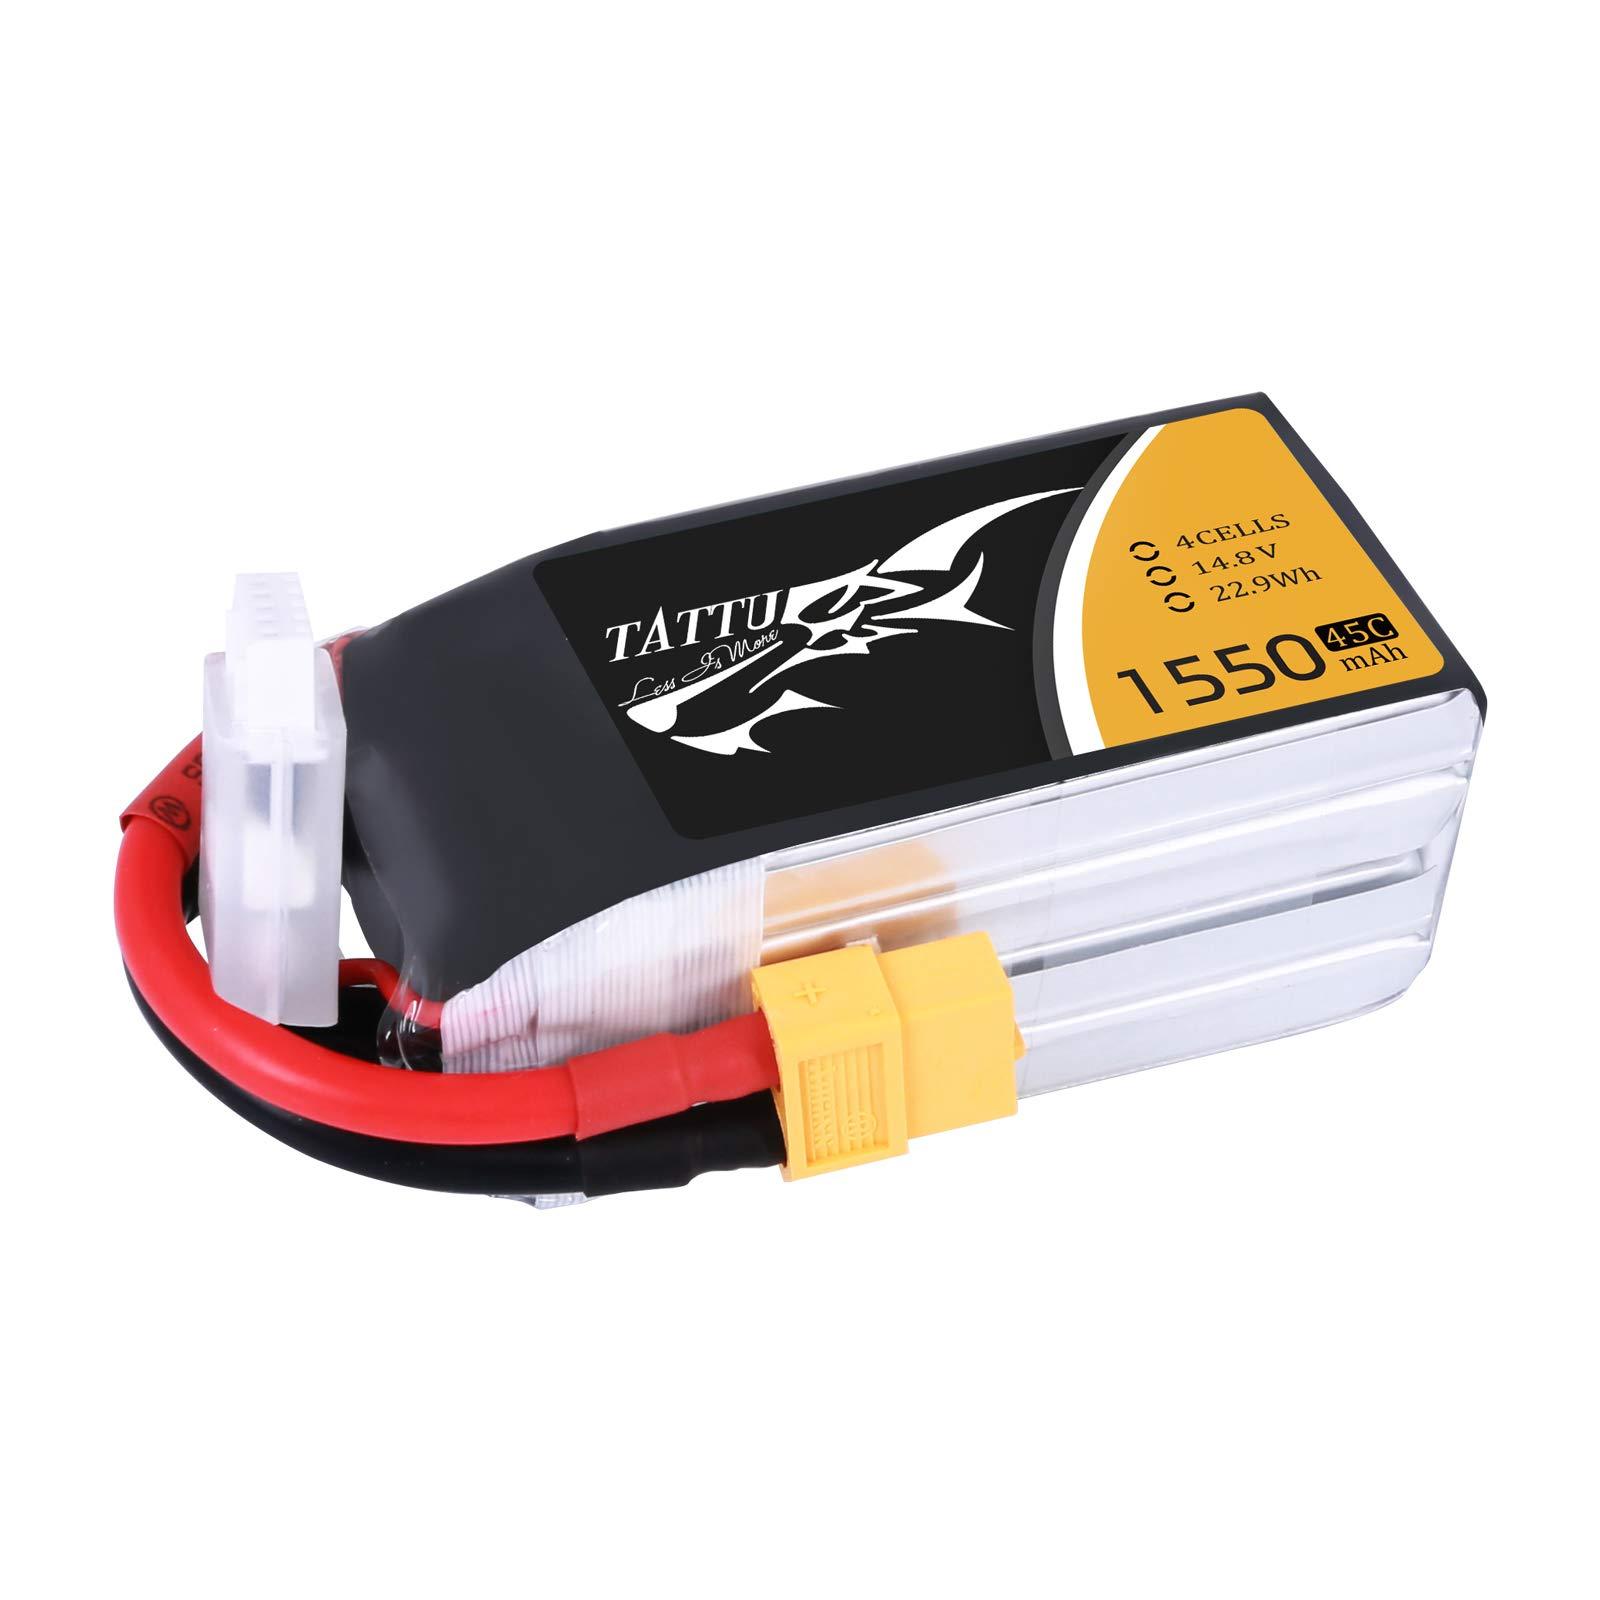 TATTU 1550mAh 14.8V 45C 4S LiPo Battery Pack with XT60 Plug for RC Boat Truck Heli Airplane UAV Drones FPV